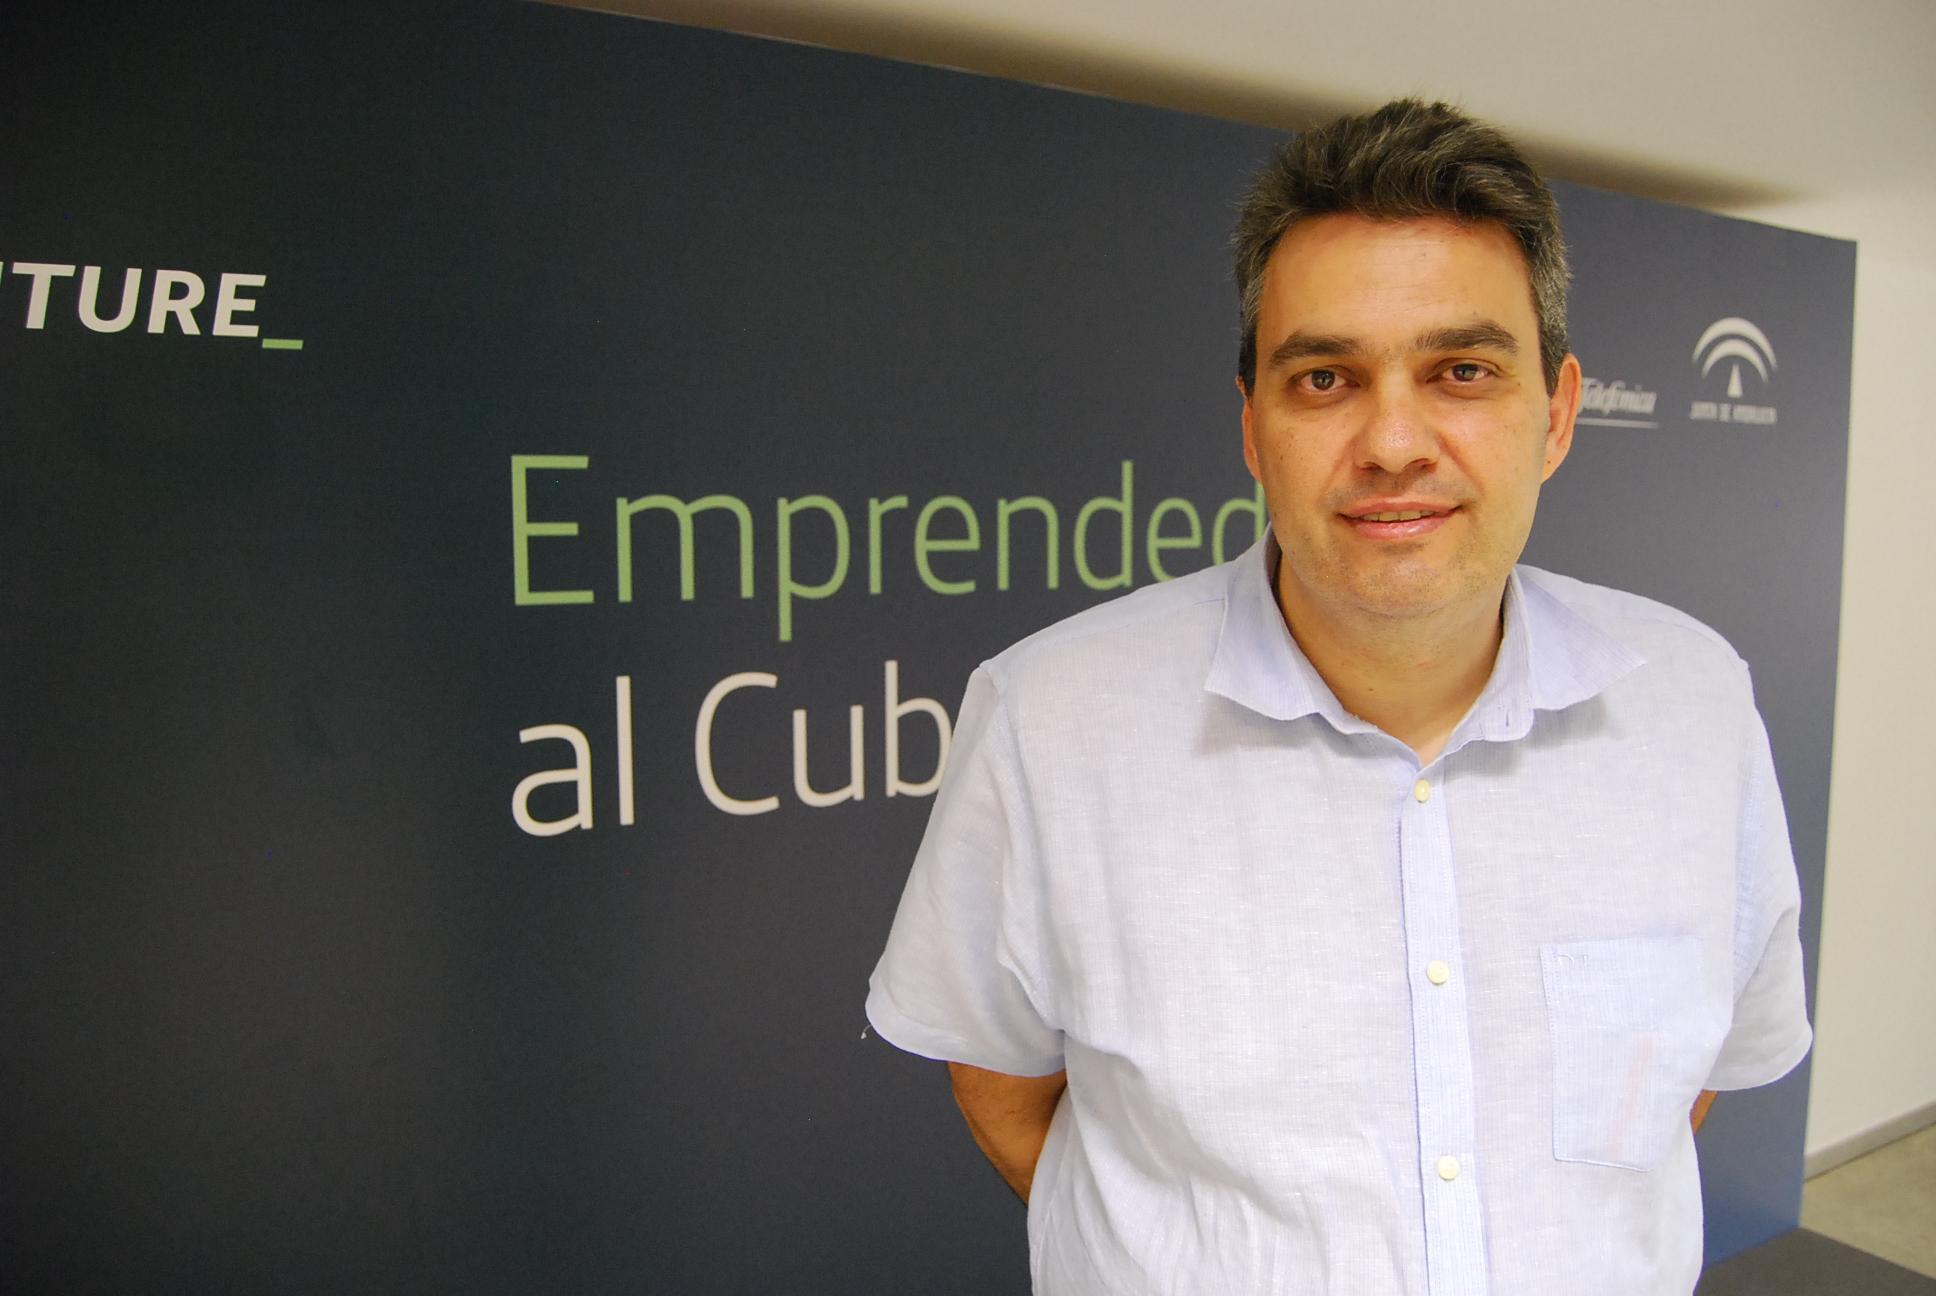 Pablo Merino